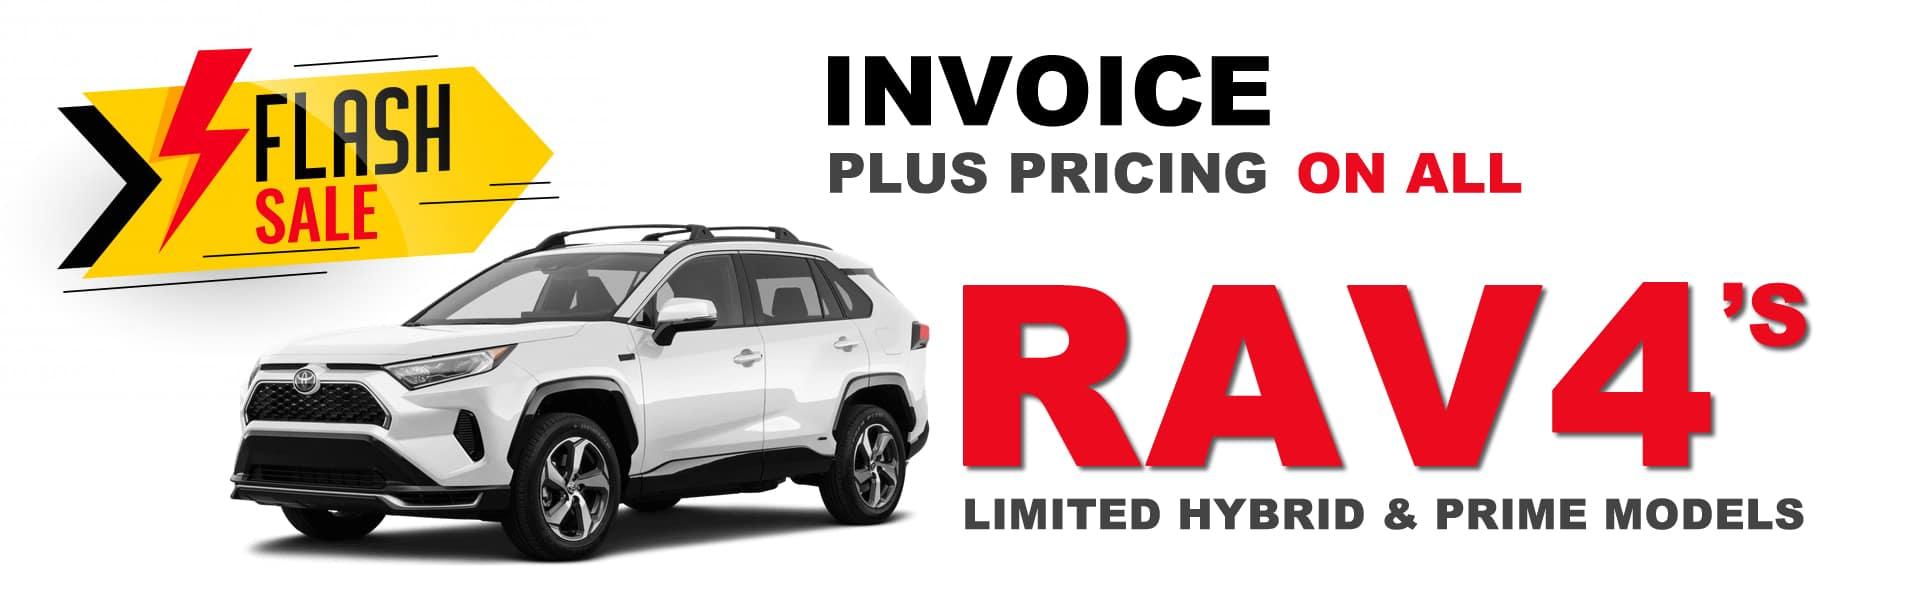 RAV4 Invoice Plus Pricing